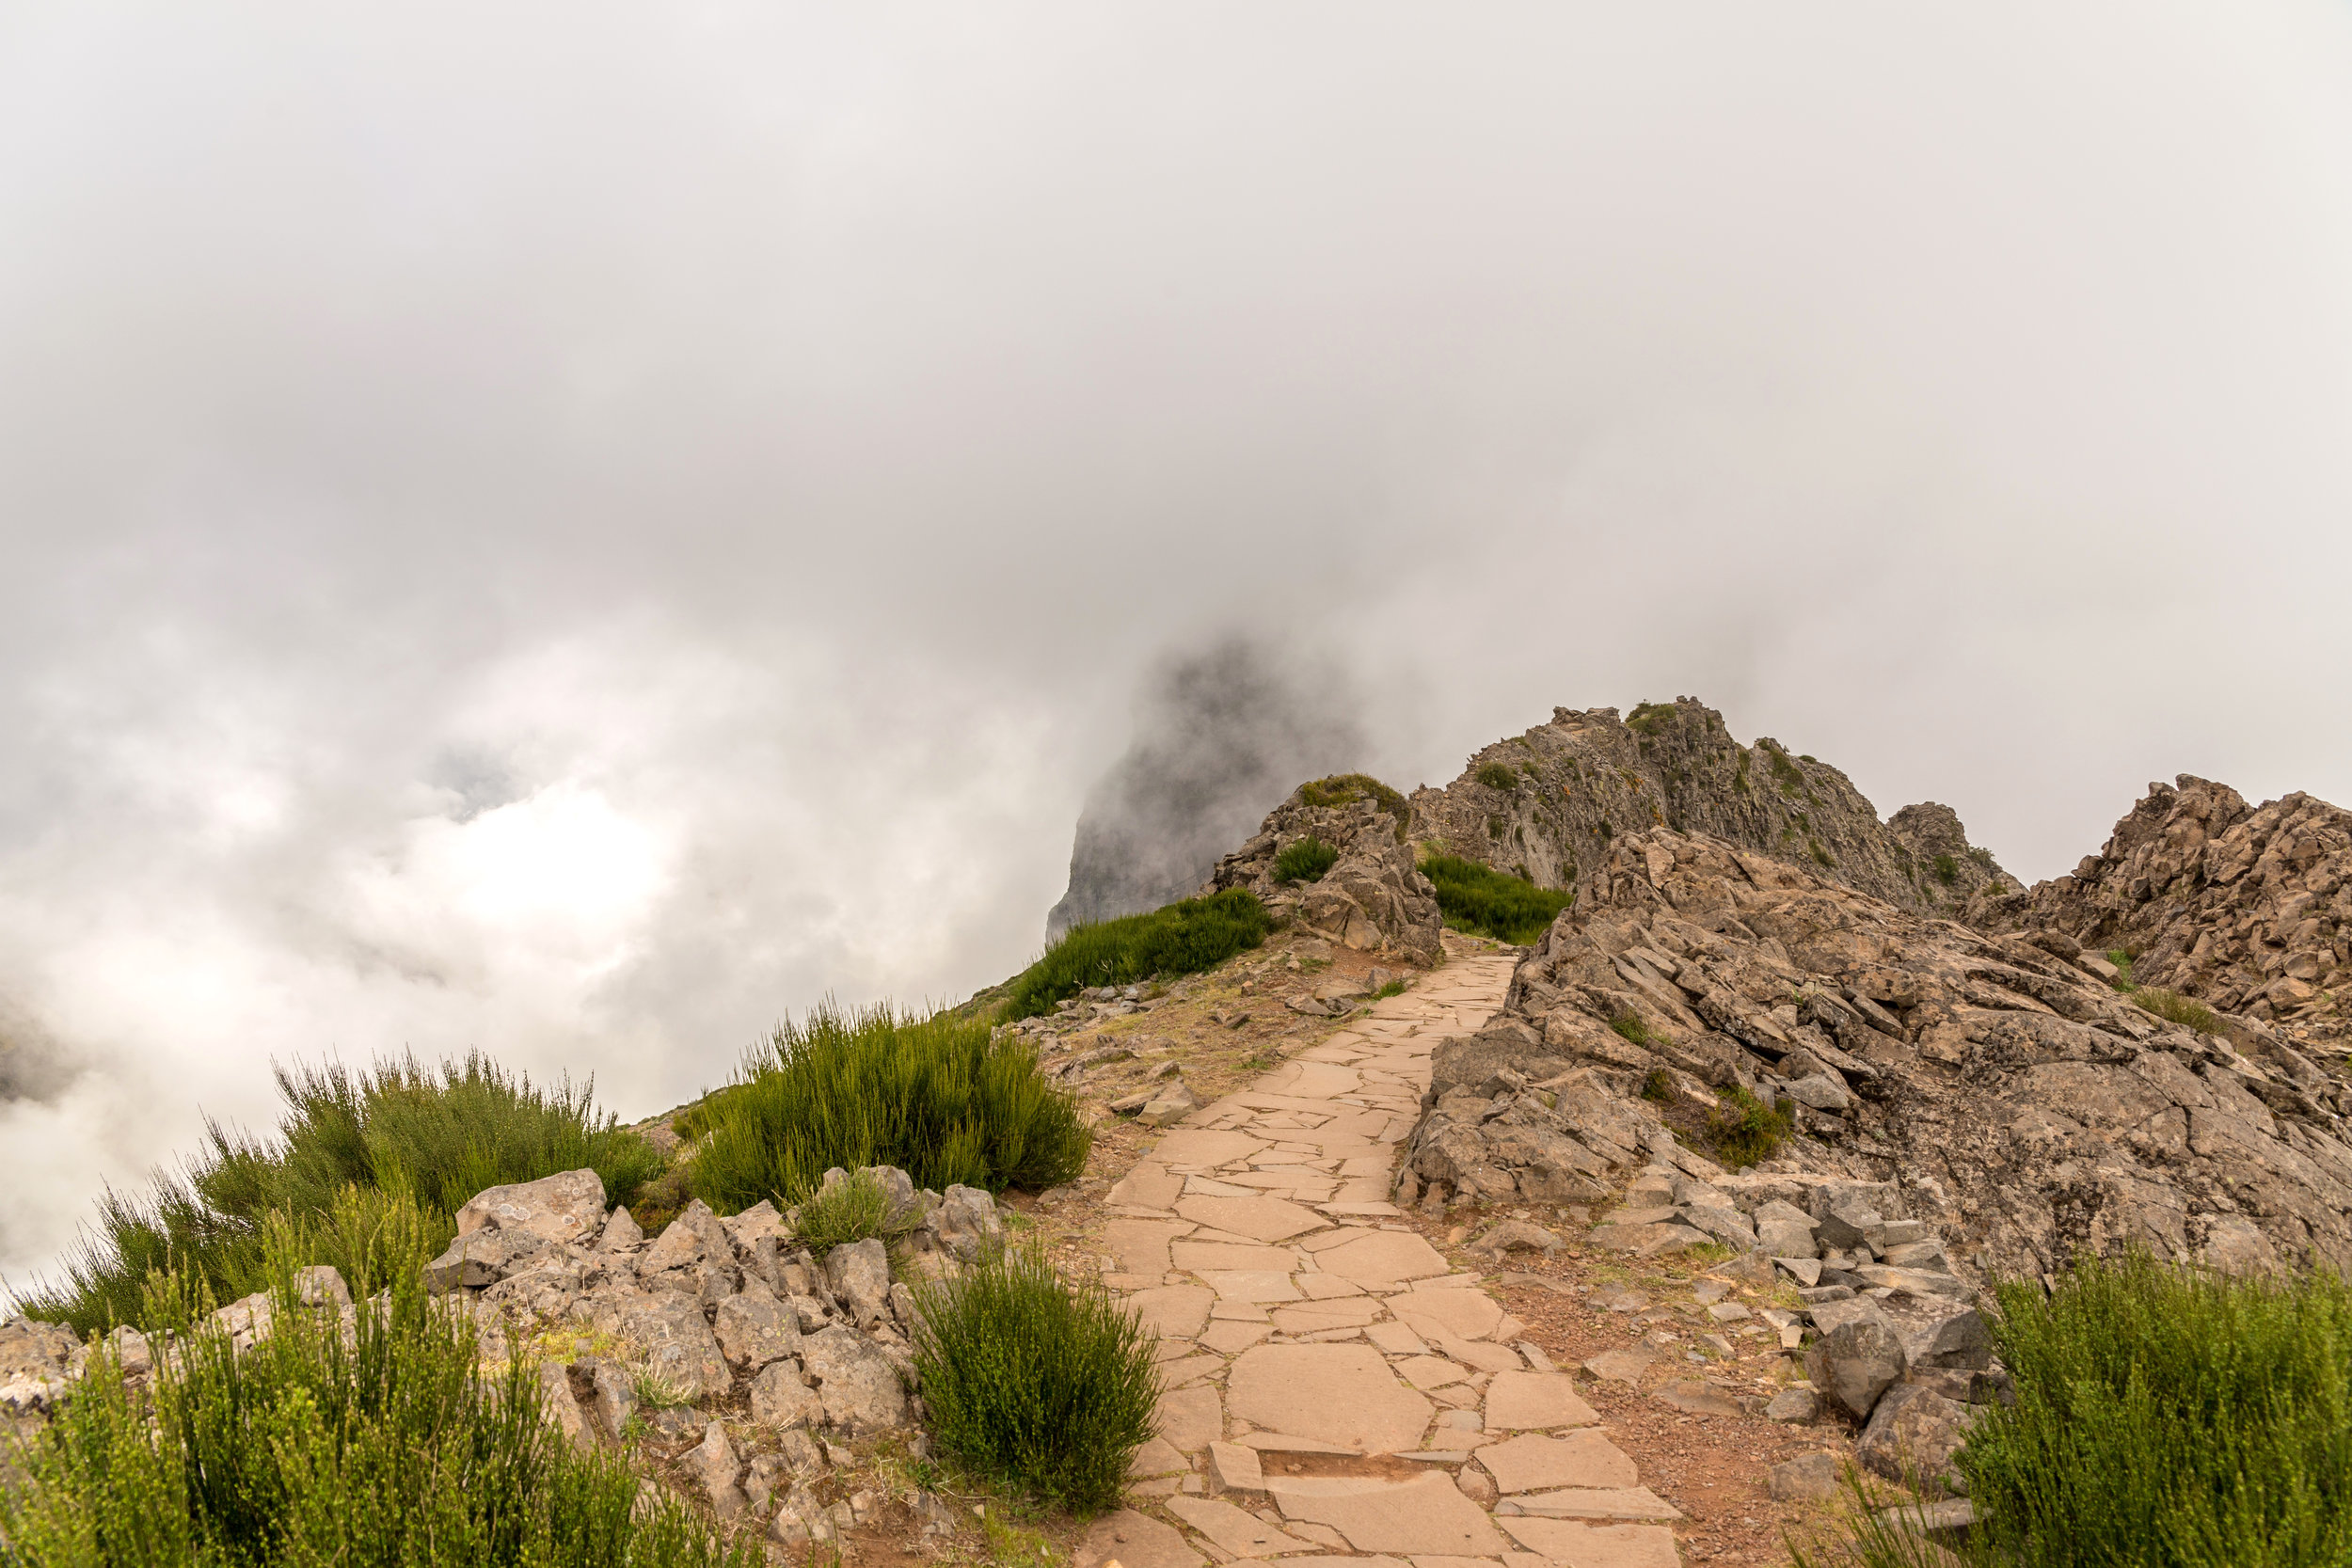 Leaving Pico do Arieiro in the mist, Madeira